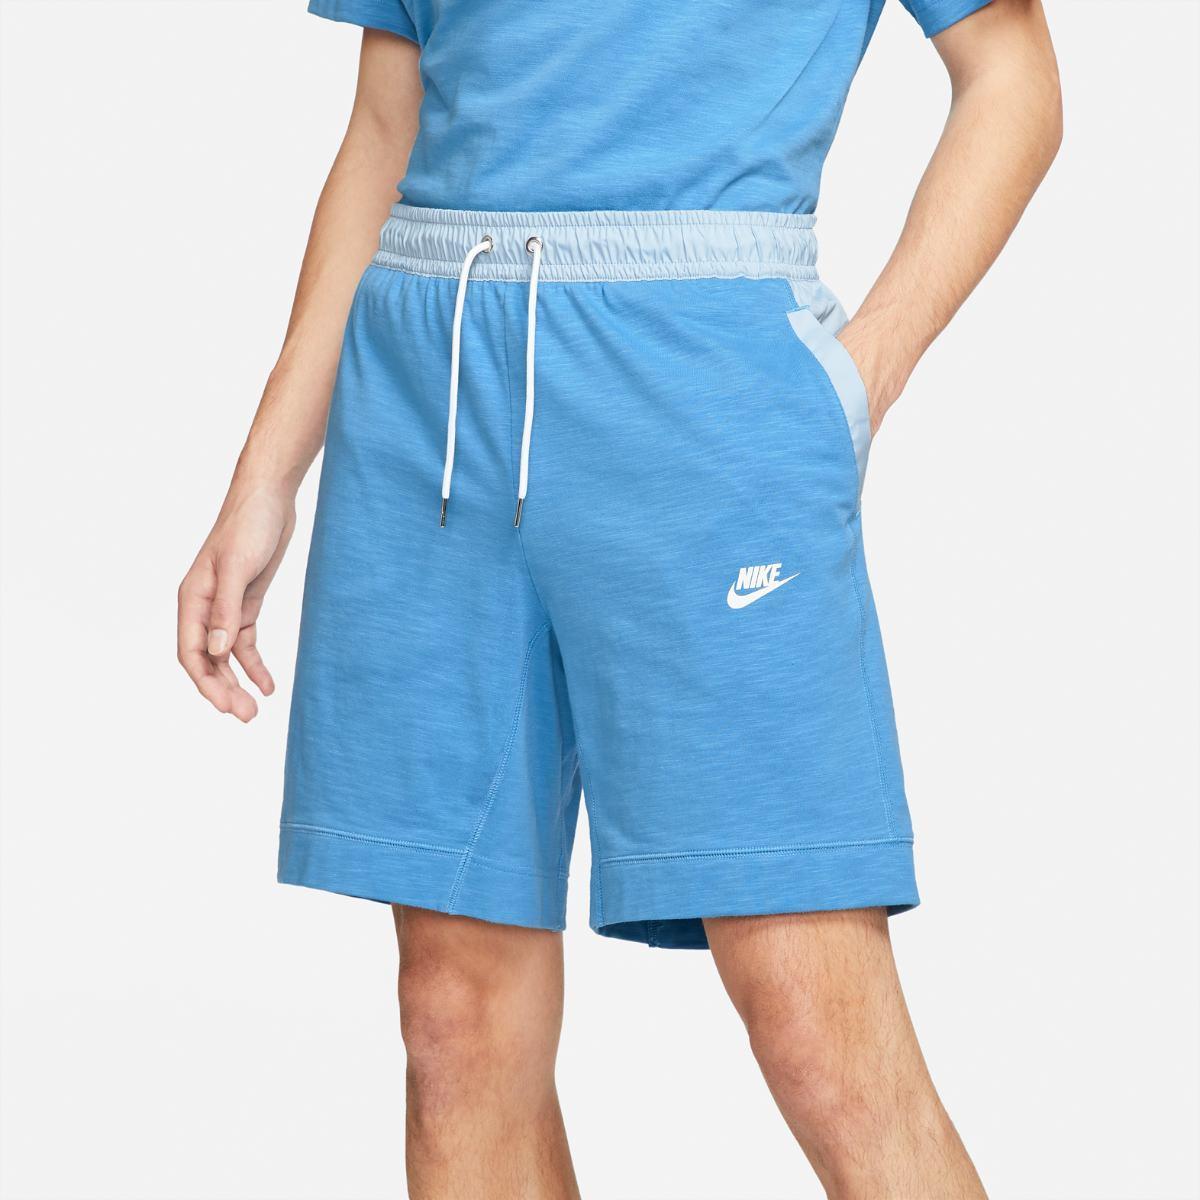 Шорты Nike Sportswear Short Black CZ9868-462 Синий